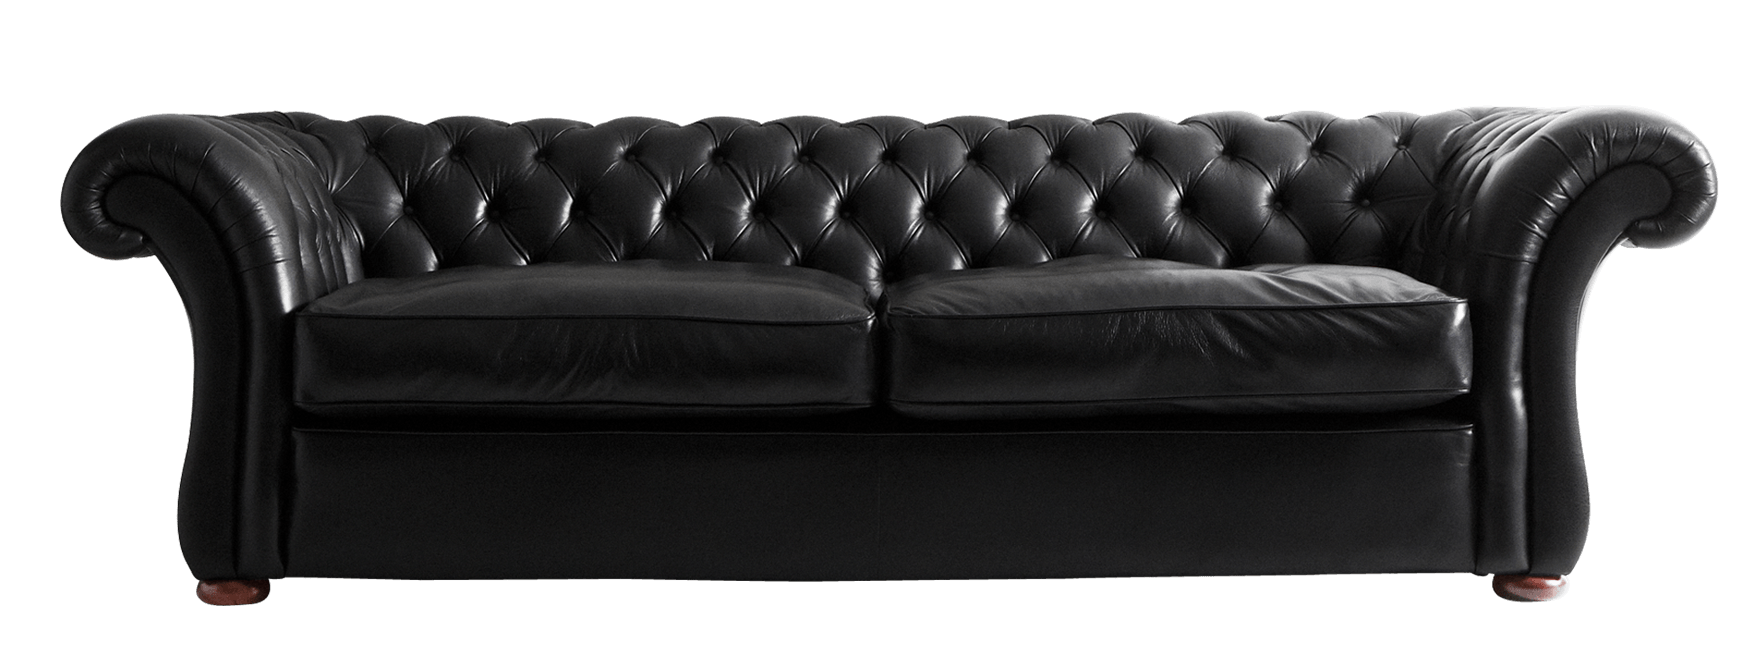 Black Leather Sofa transparent PNG.